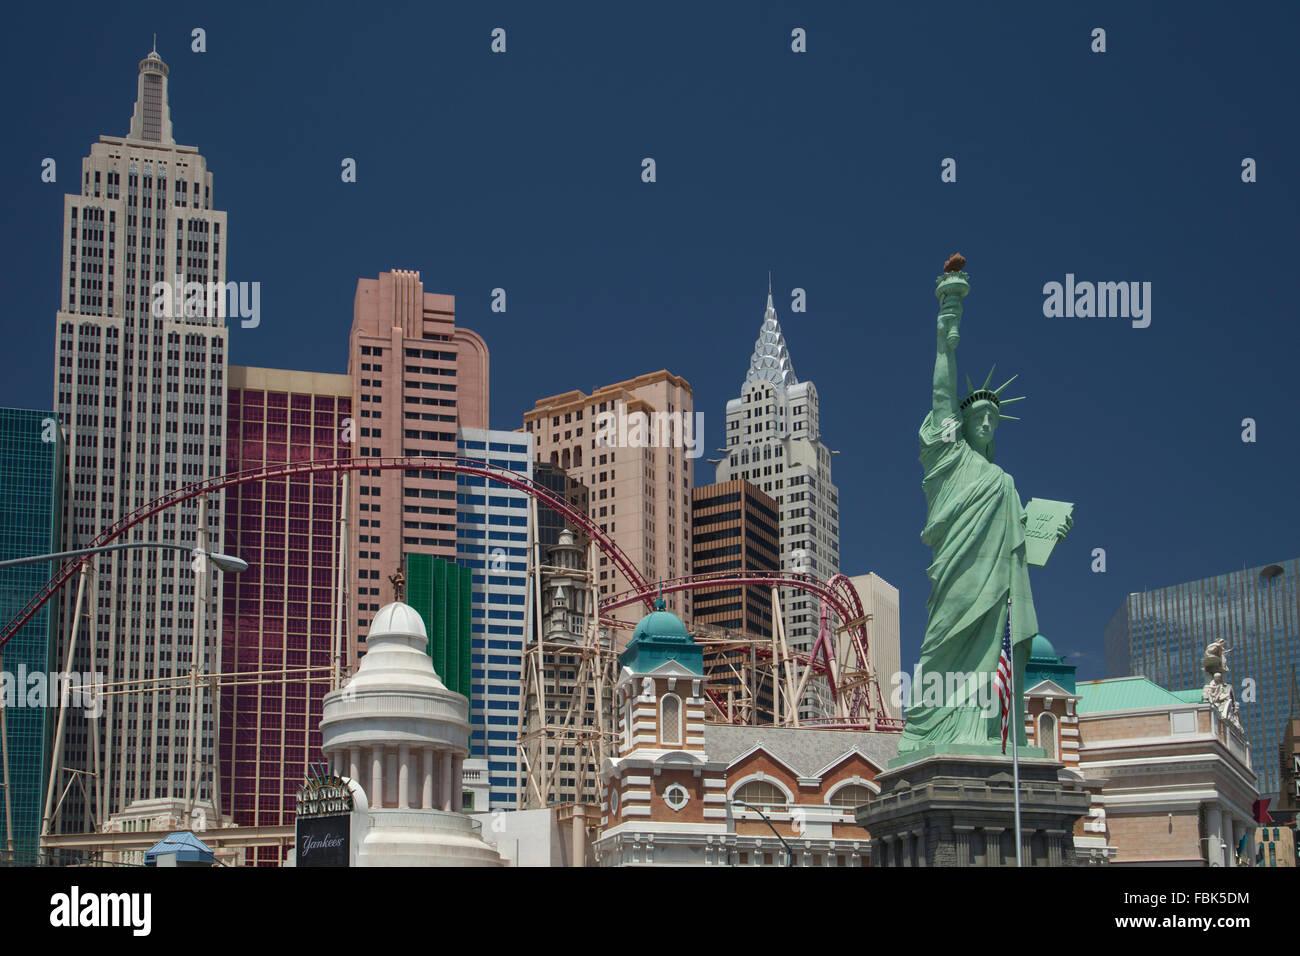 New York New York Casino - Las Vegas Stockbild